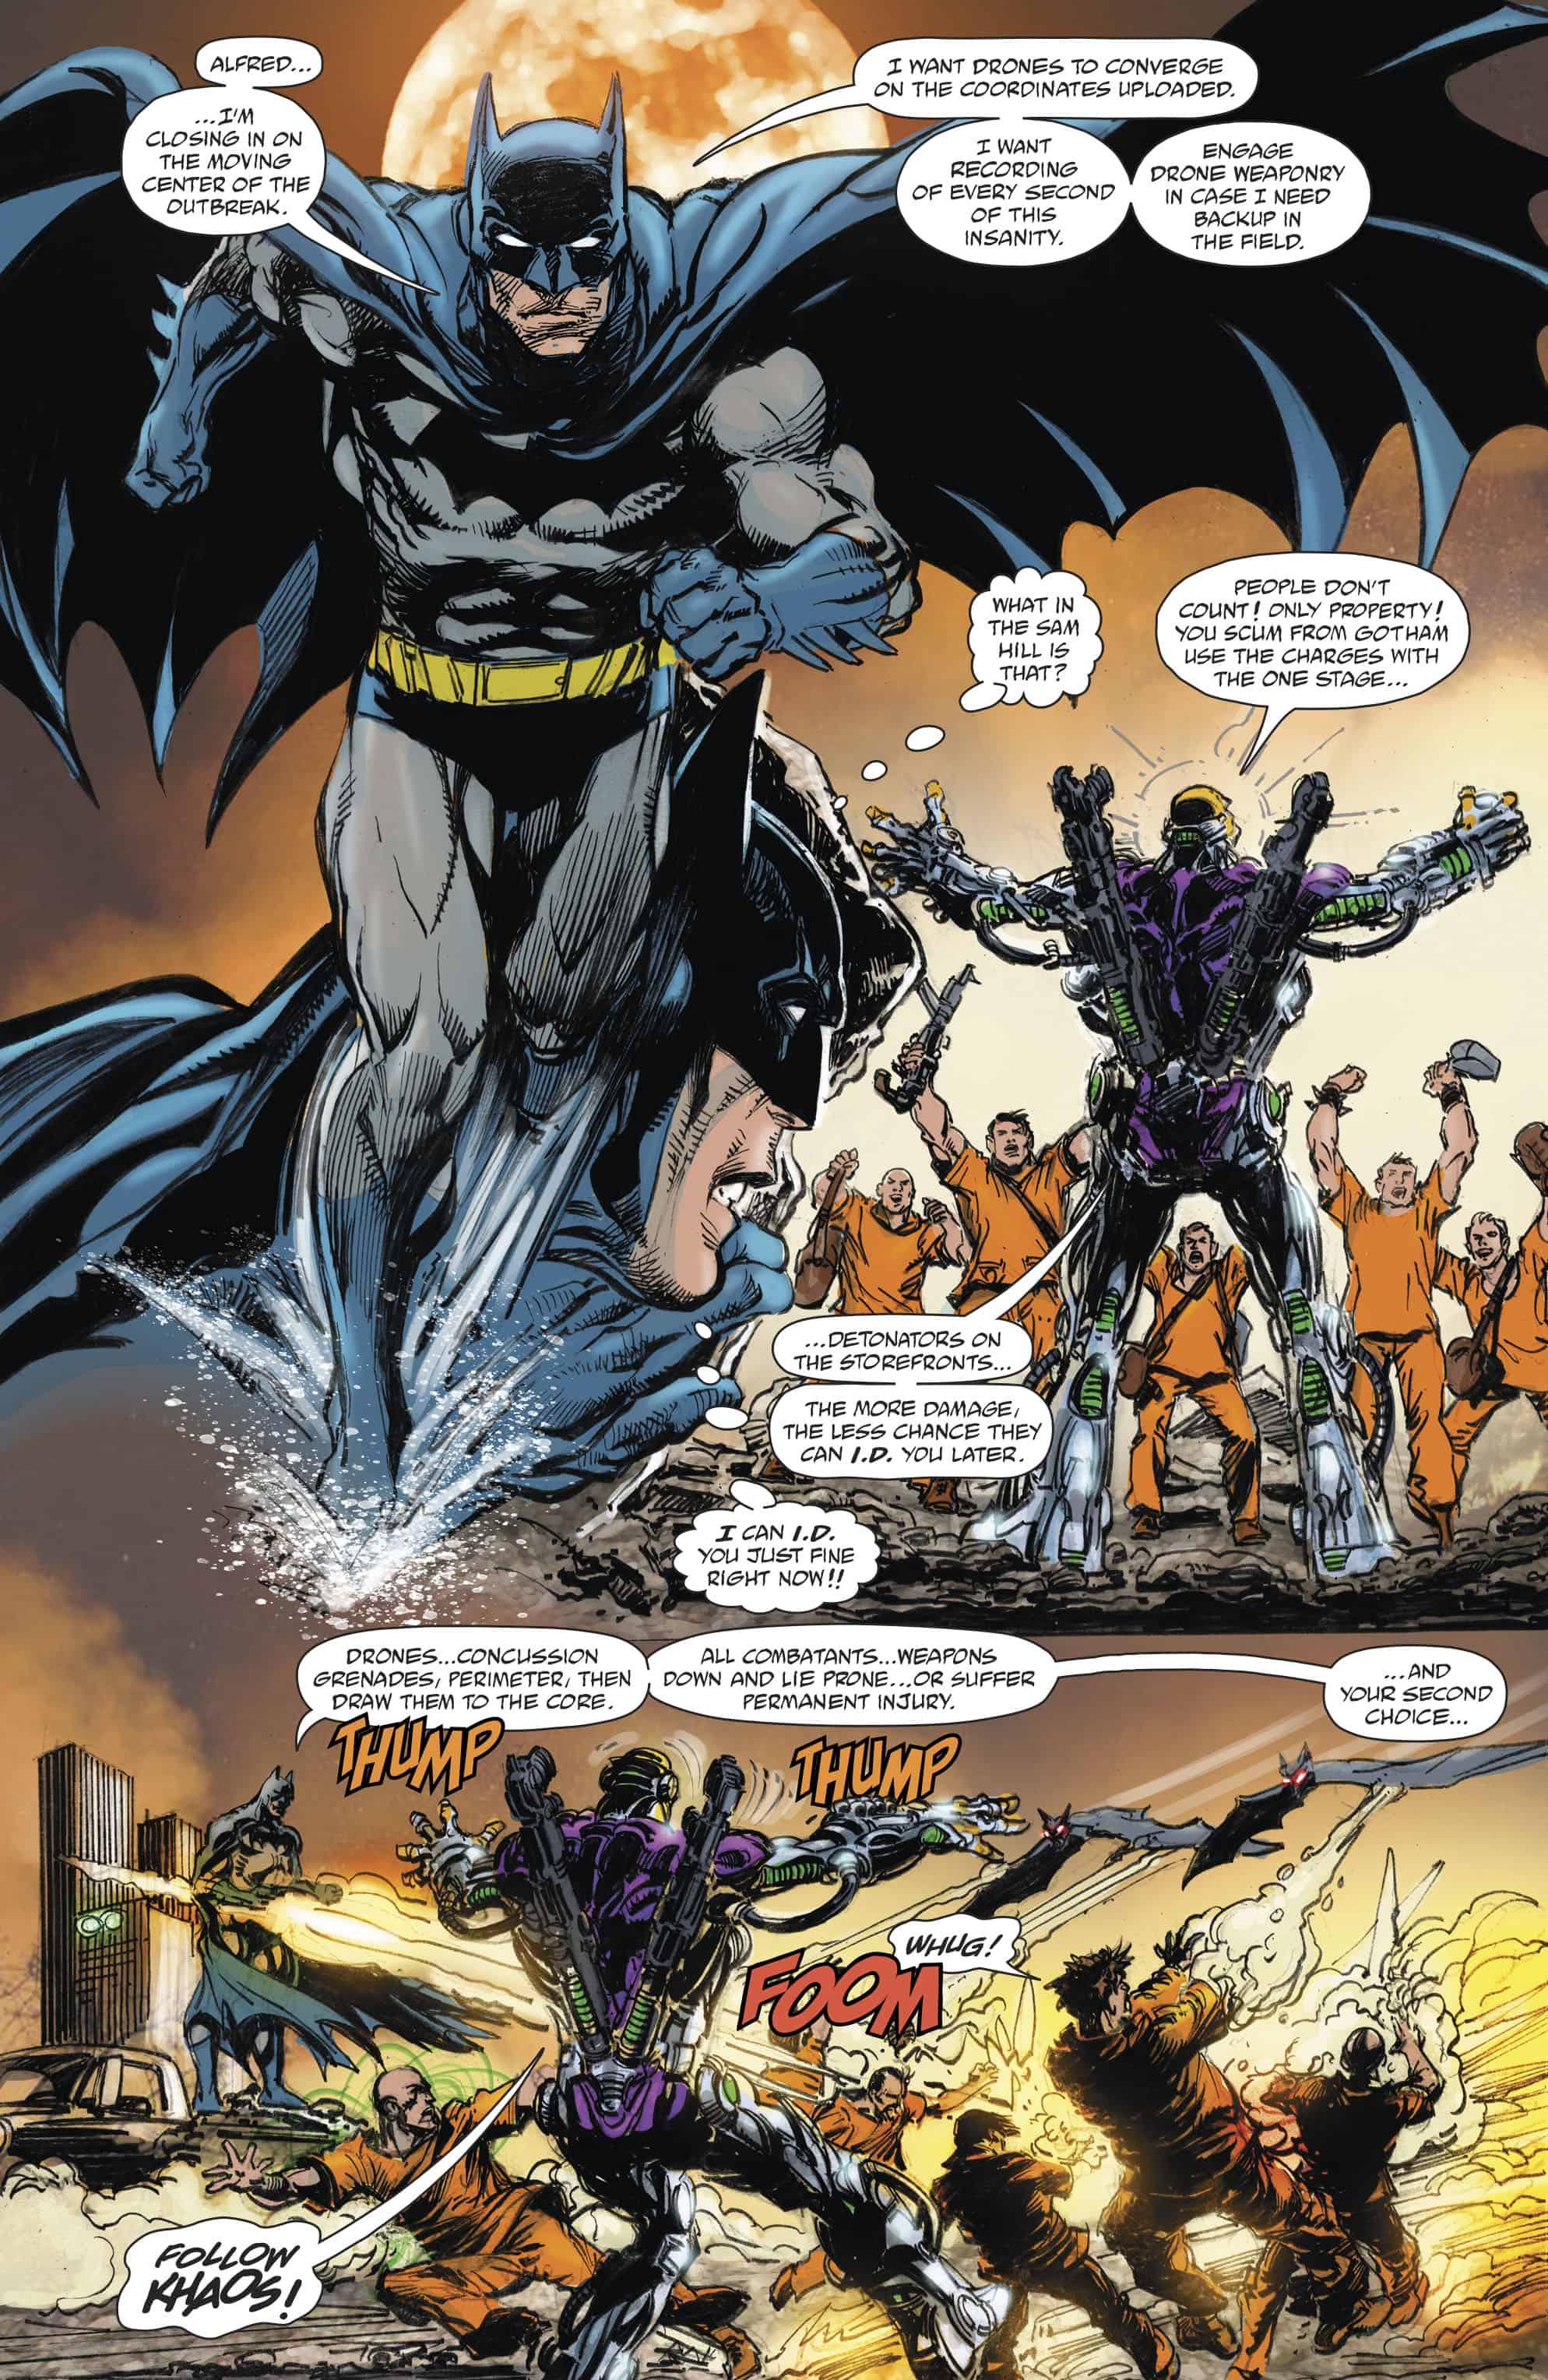 Batman vs Ra's Al Ghul #1 - Comic Watch